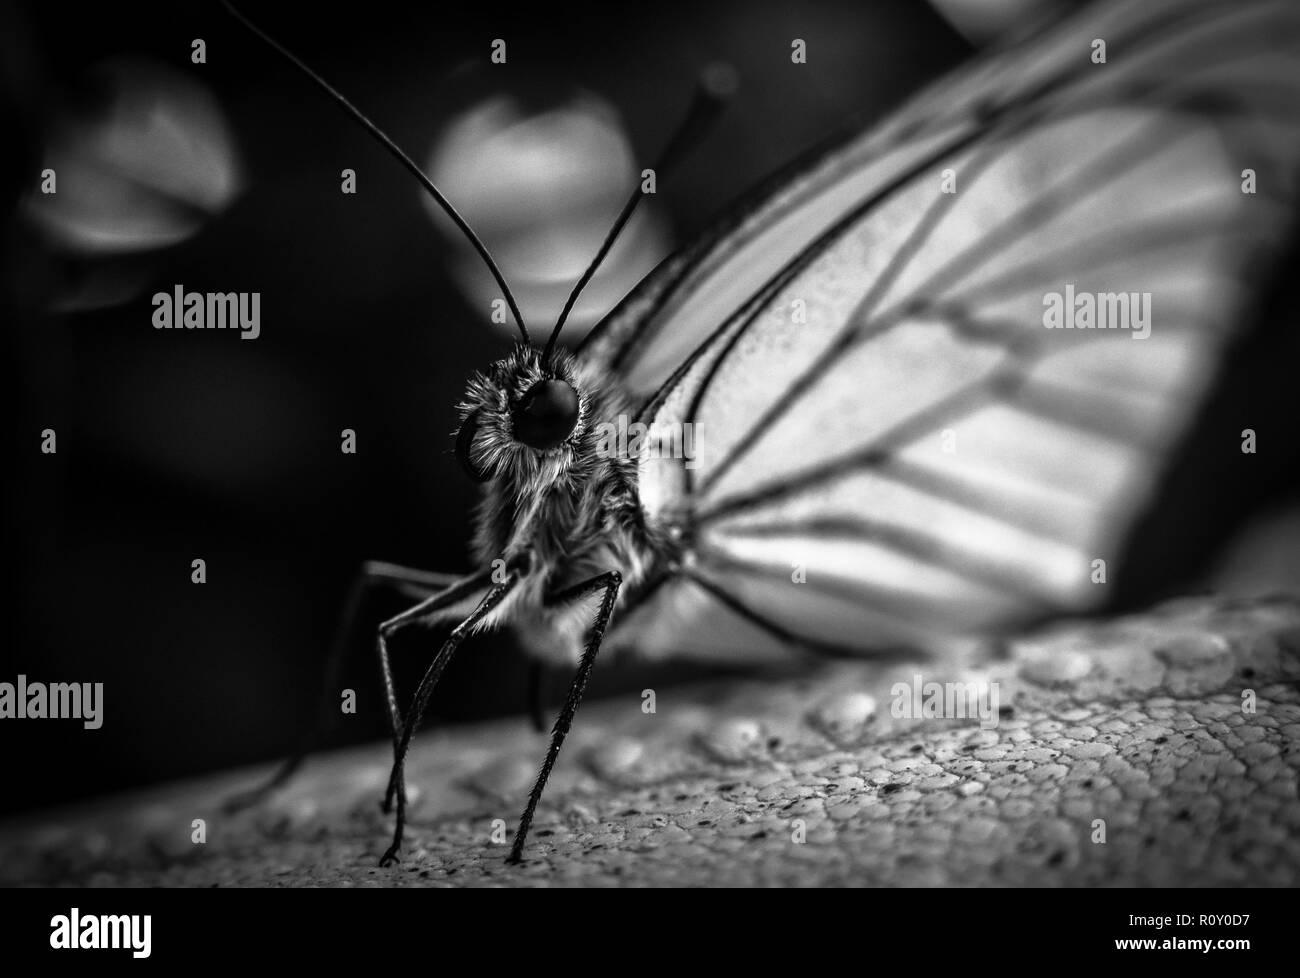 Butterfly mit großen weißen Flügel - B&W Stockbild